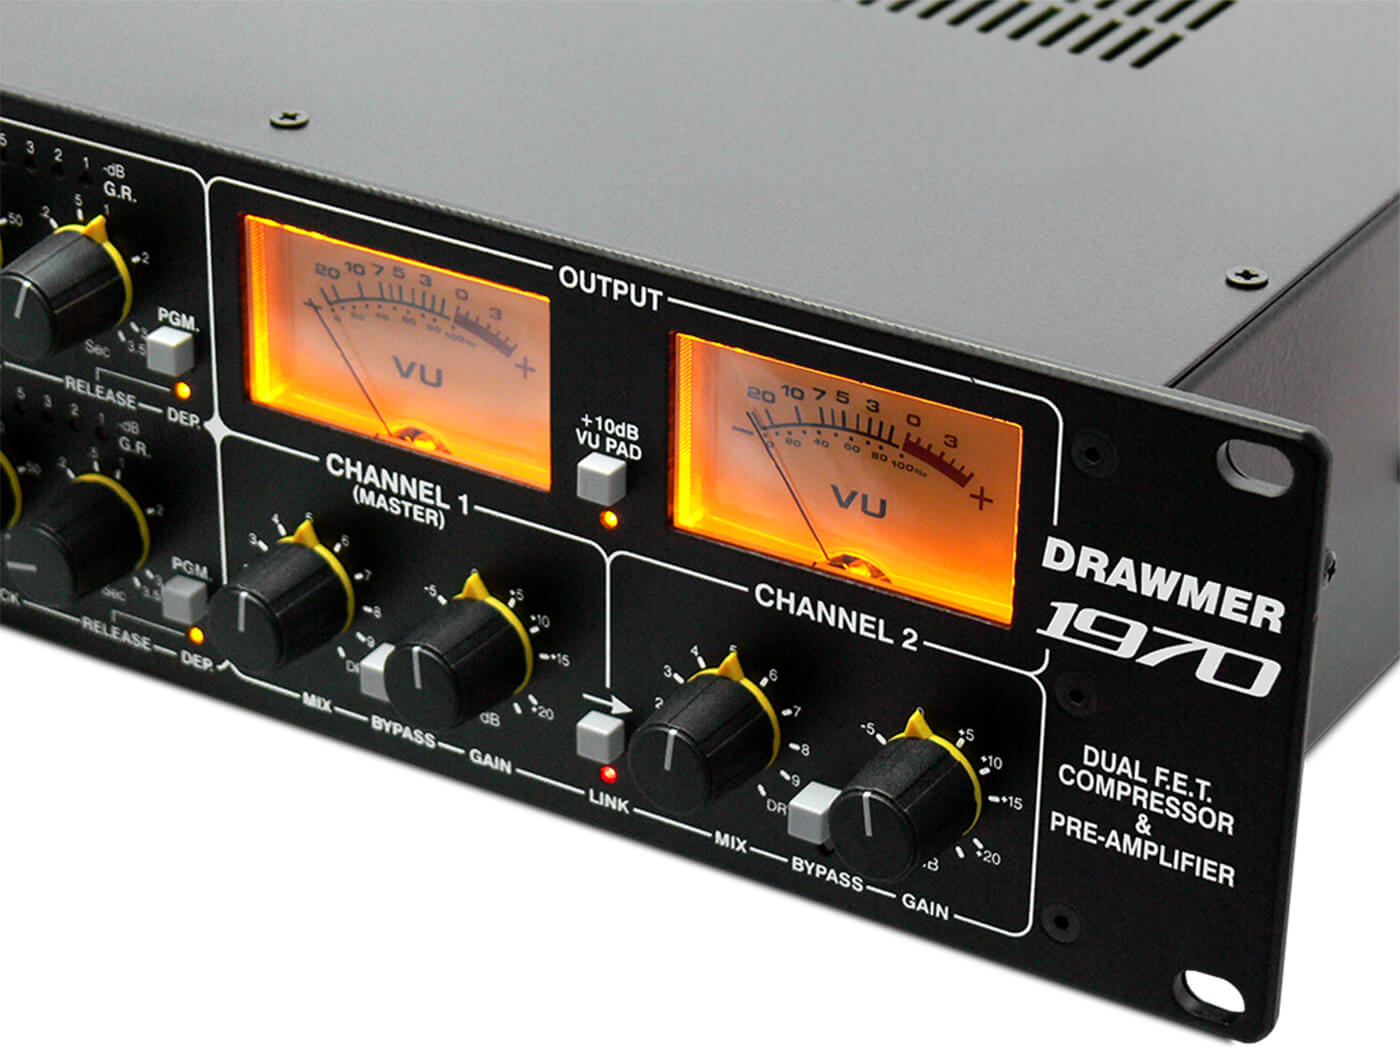 NAMM 2020: Drawmer releases the 1970 Dual FET Compressor And Pre-amplifier - MusicTech